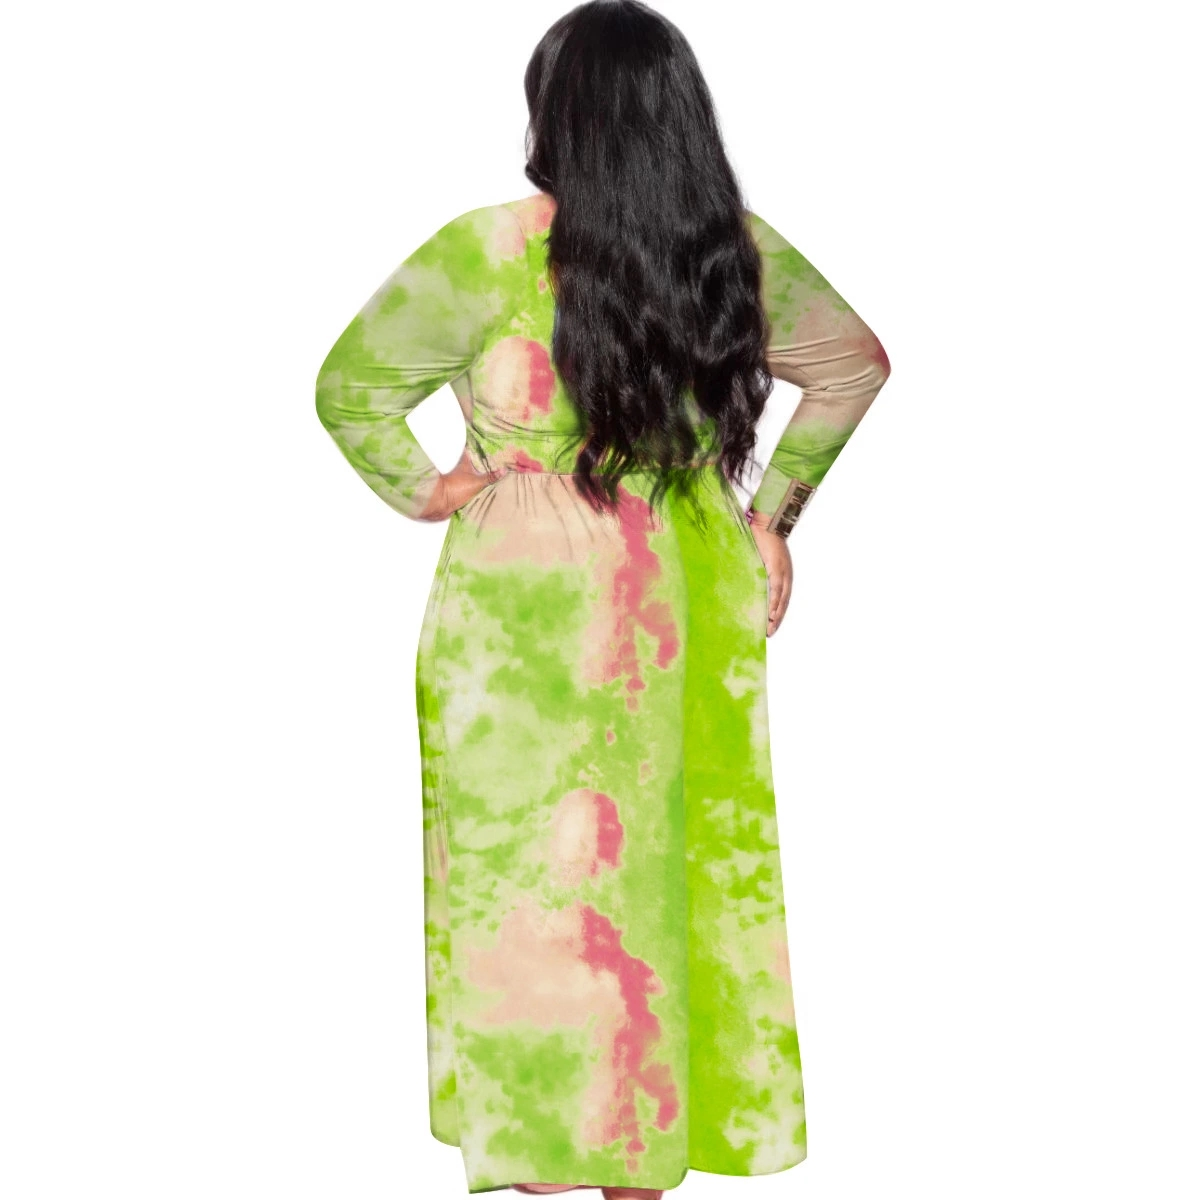 Foma D1063 Hot style fashion tie dye 5XL party wear fashion women clothing plus size dresses